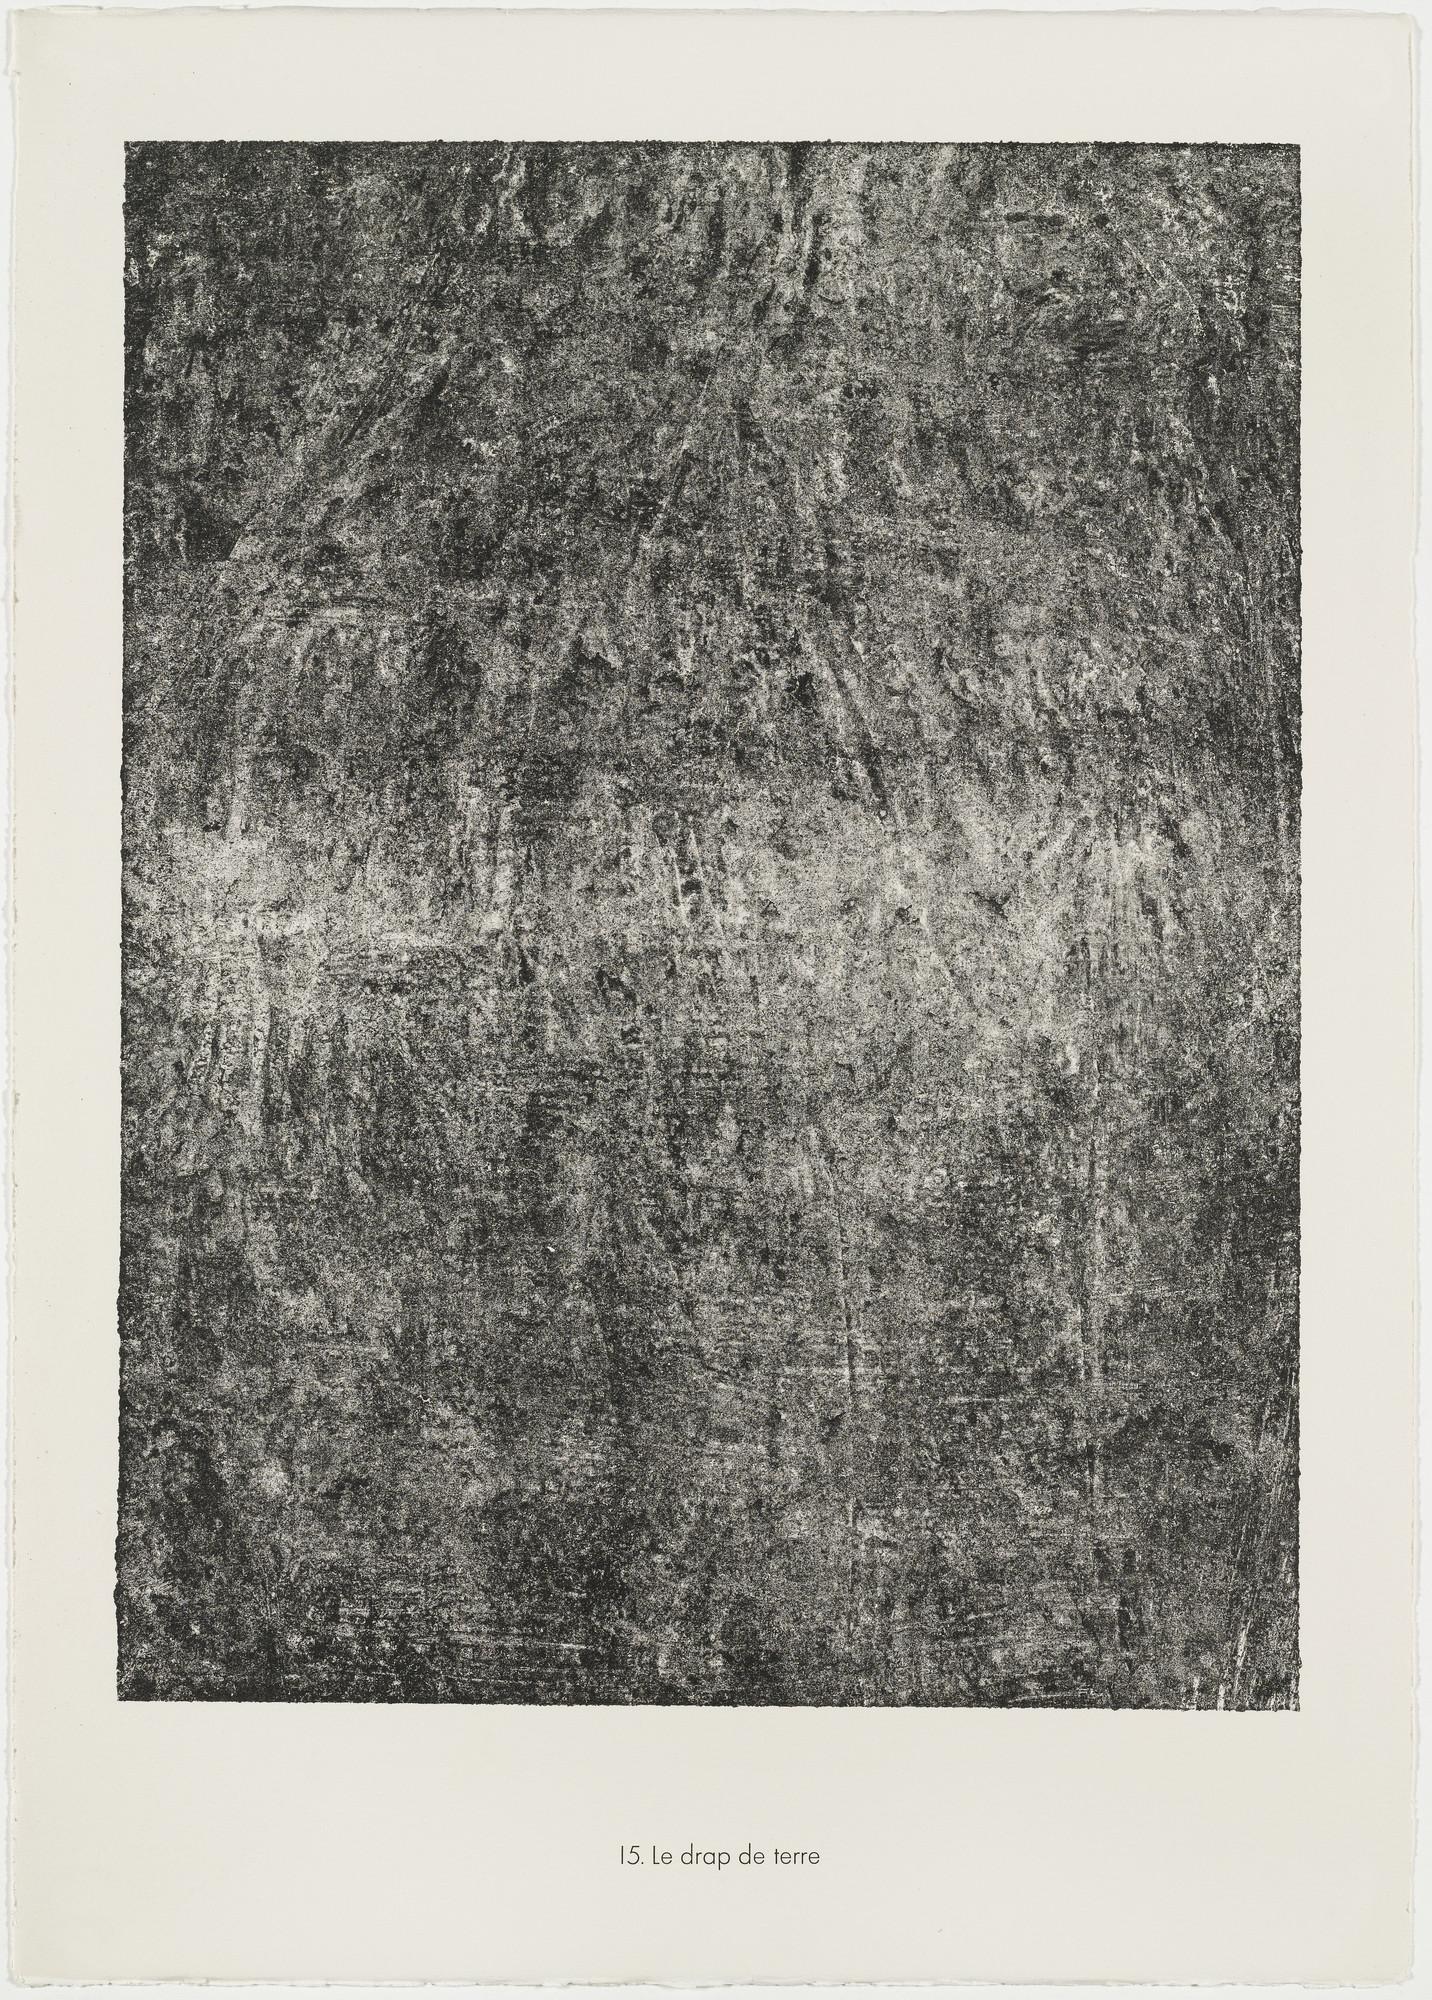 Jean Dubuffet. Sheet of Earth (Le drap de terre) from the portfolio Soil, Earth (Sols, terres) from Phenomena (Les Phénomènes). 1959